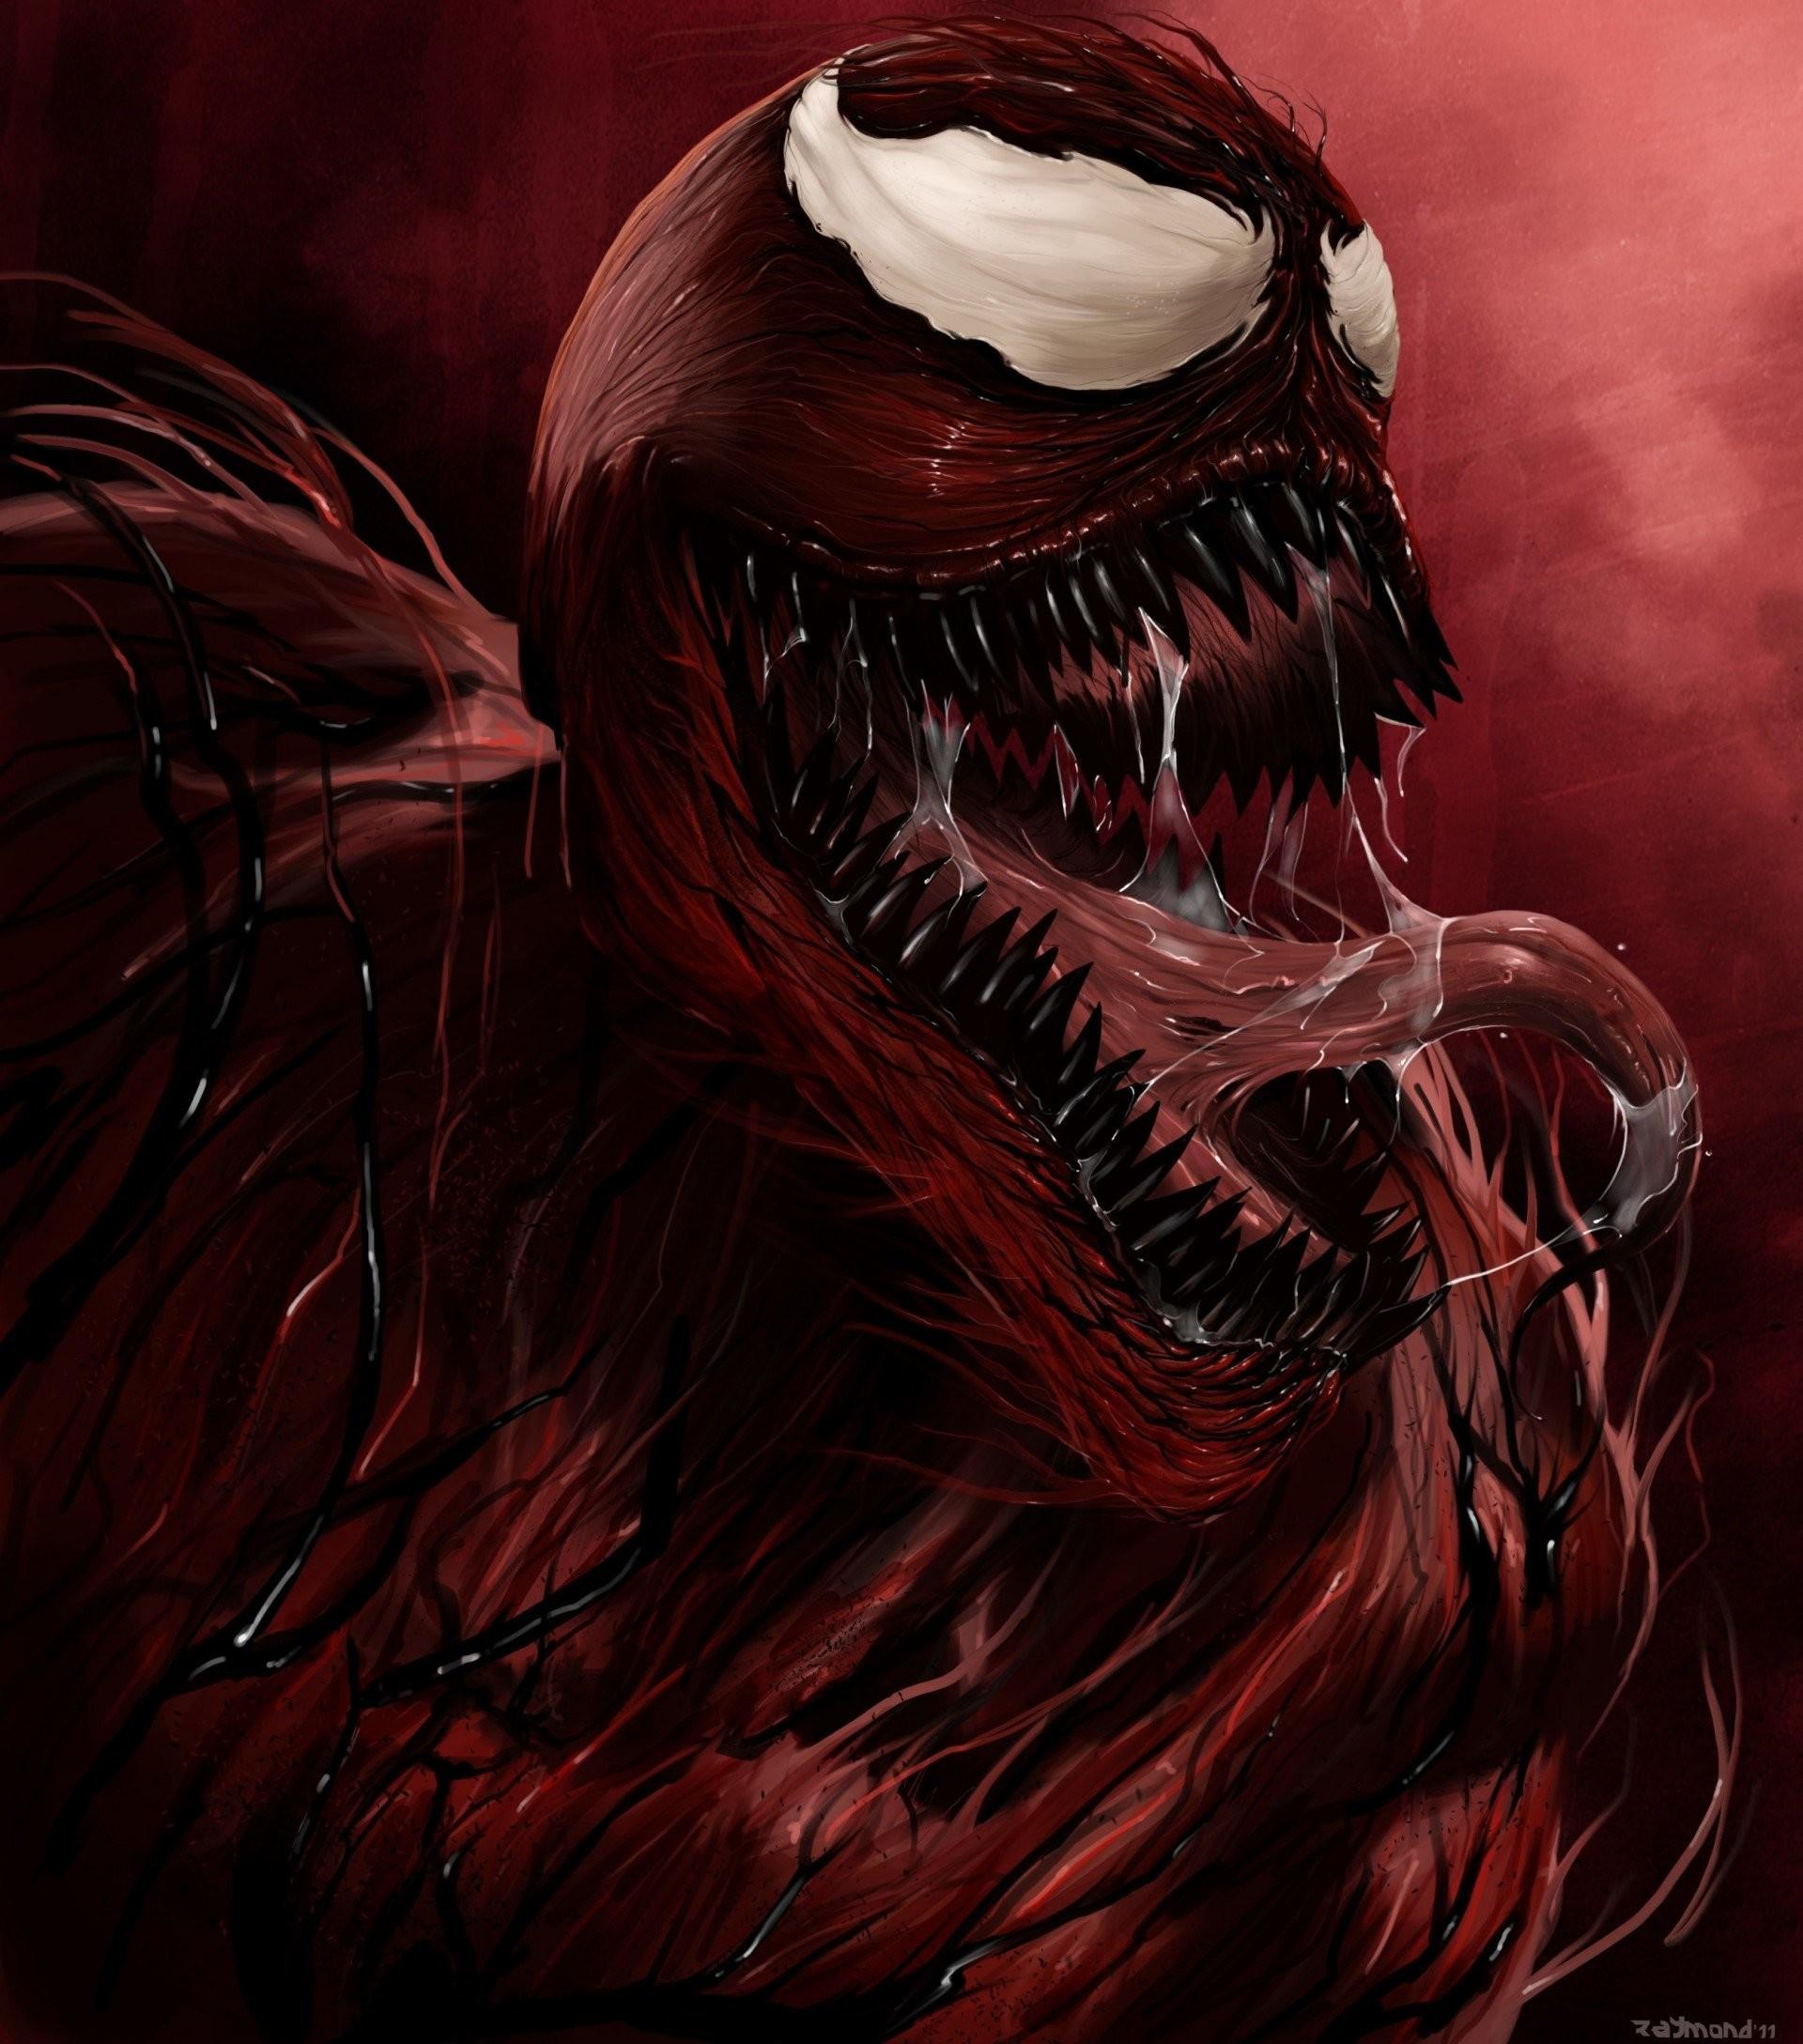 massacre carnage supervillain saliva ripper mouth comics marvel english